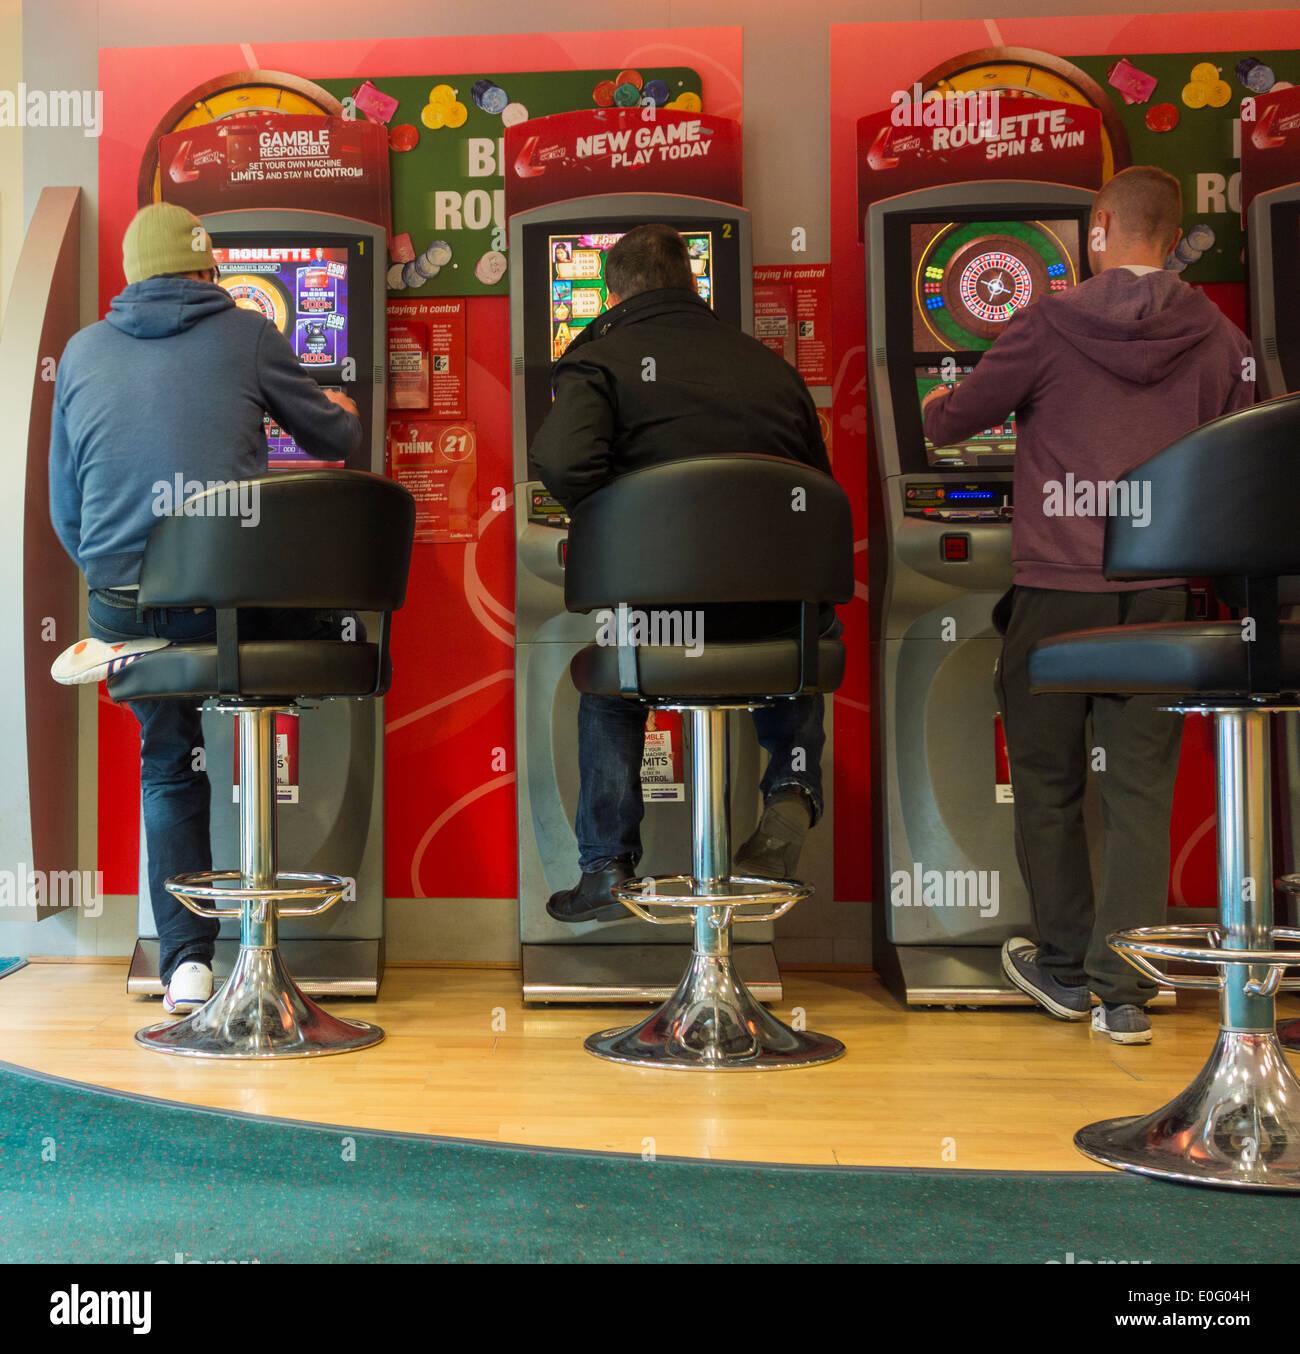 Rls medication gambling